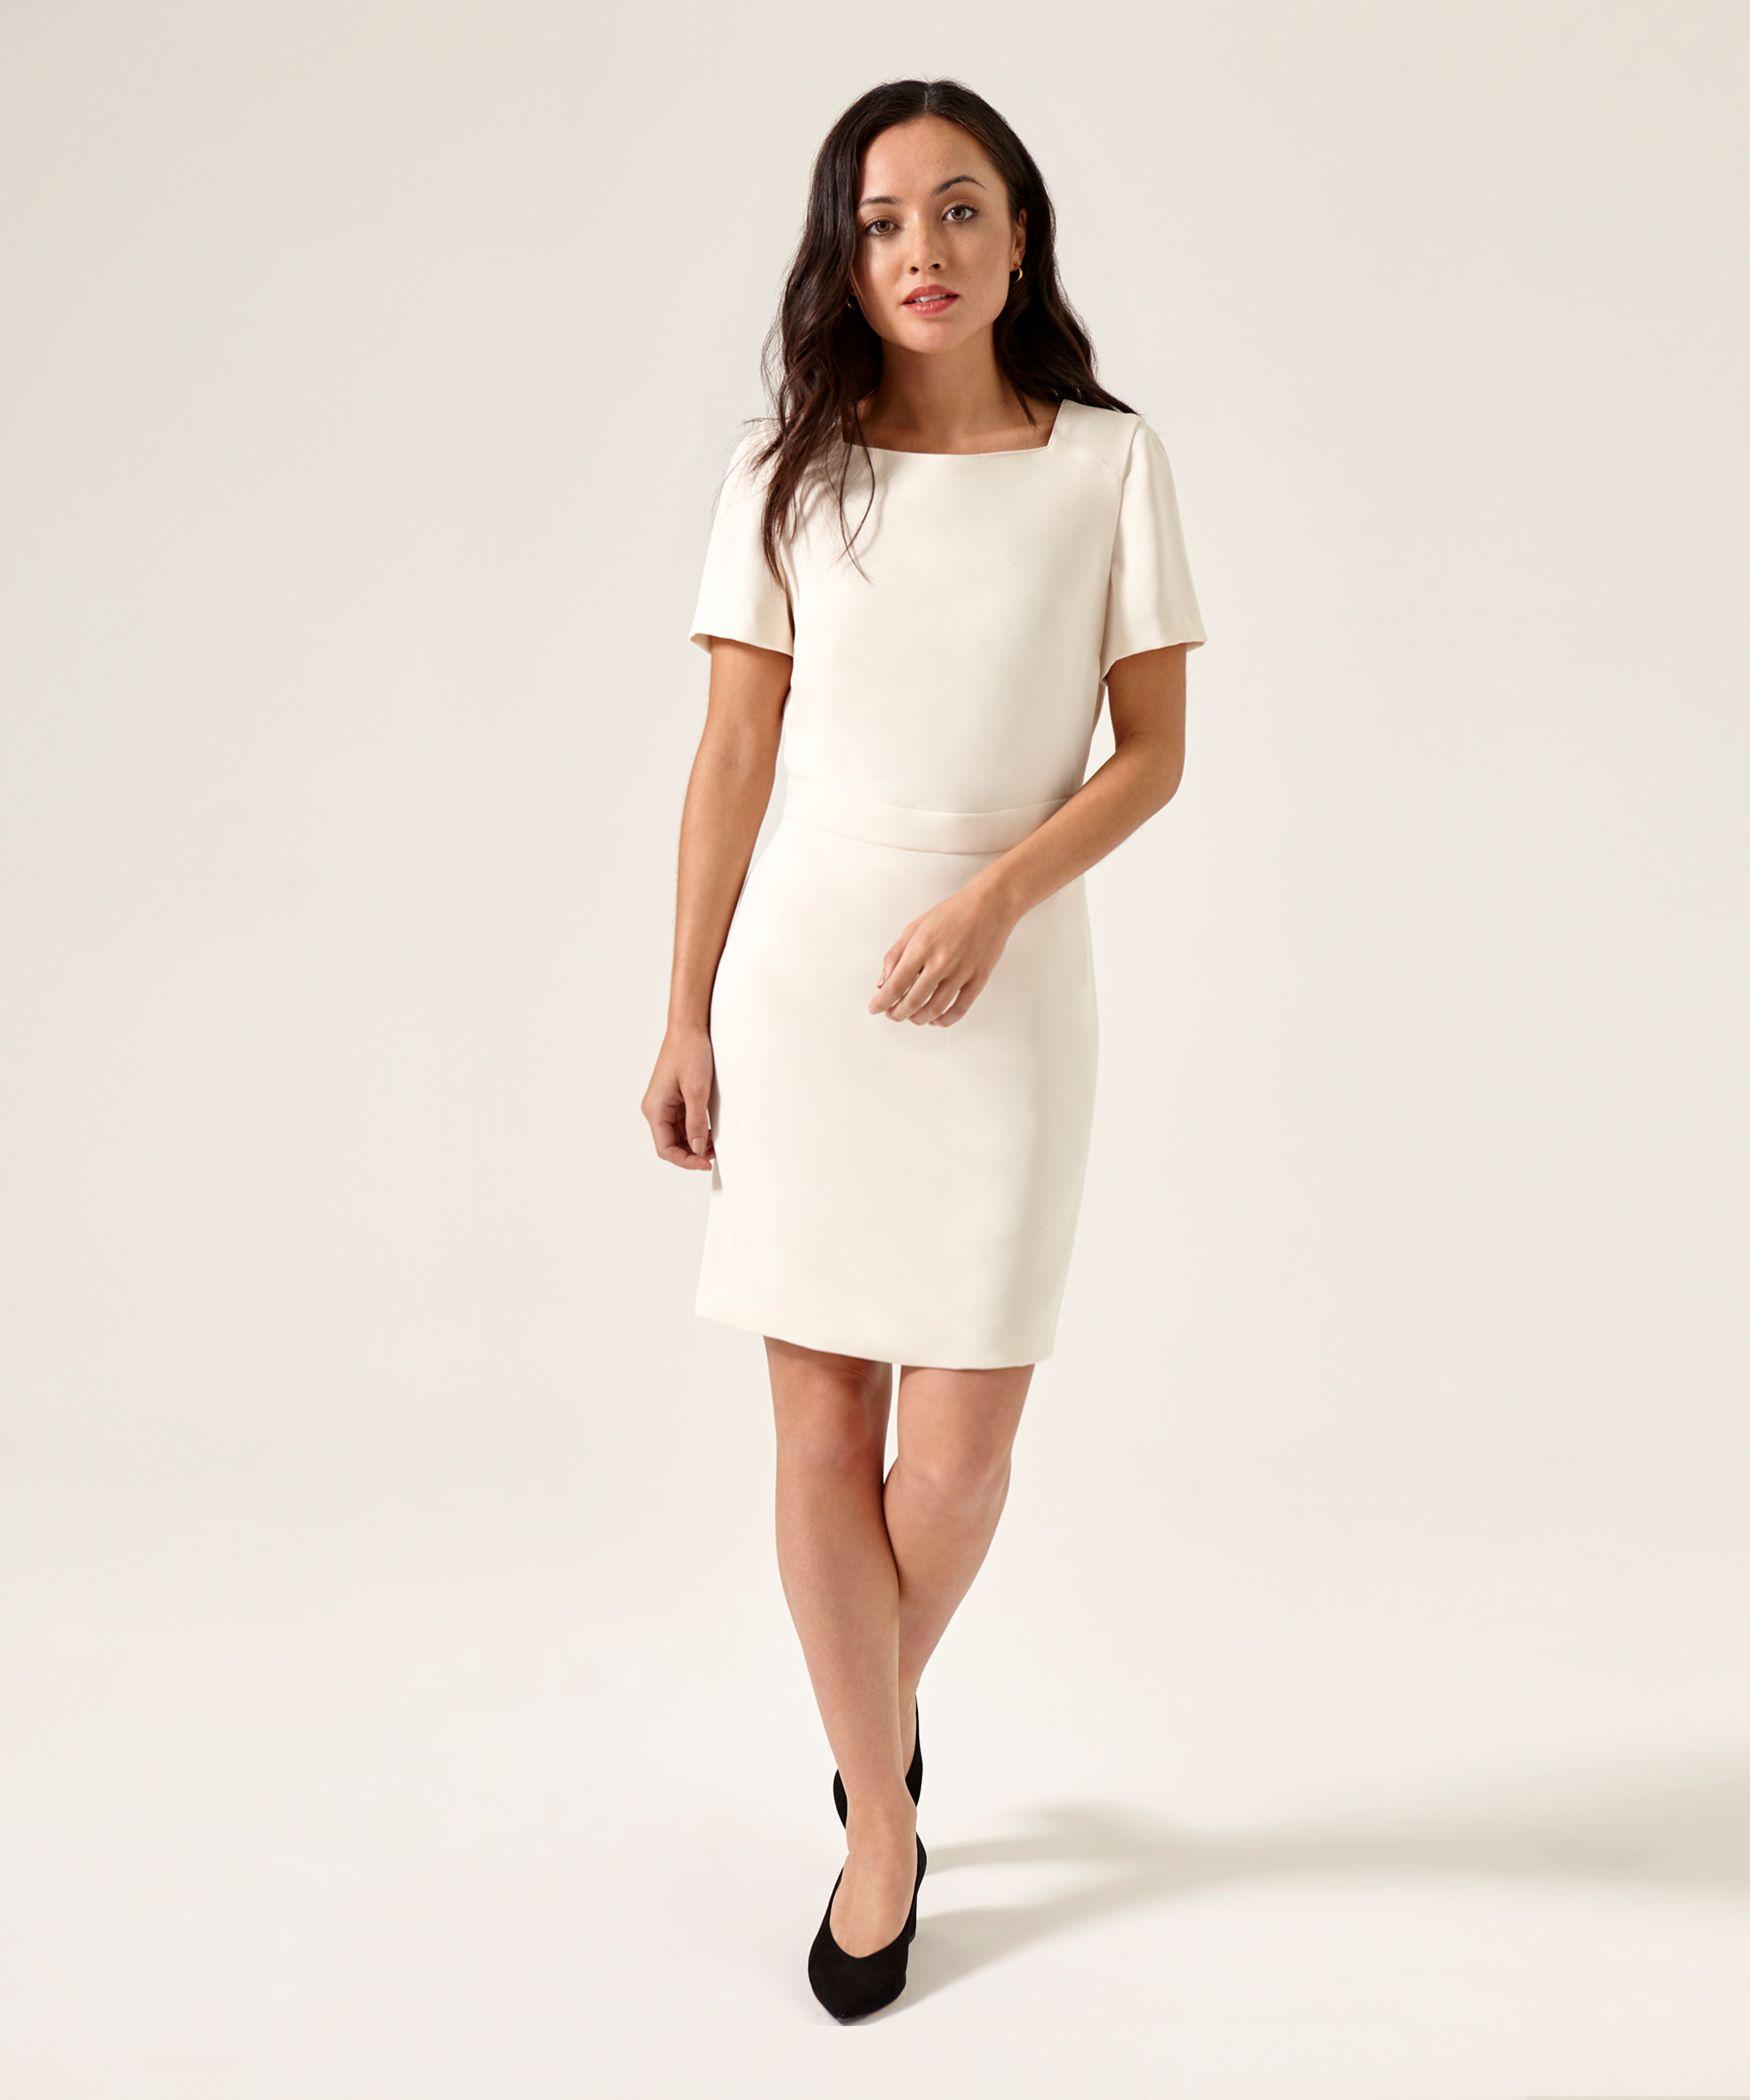 Ladies petite career dresses